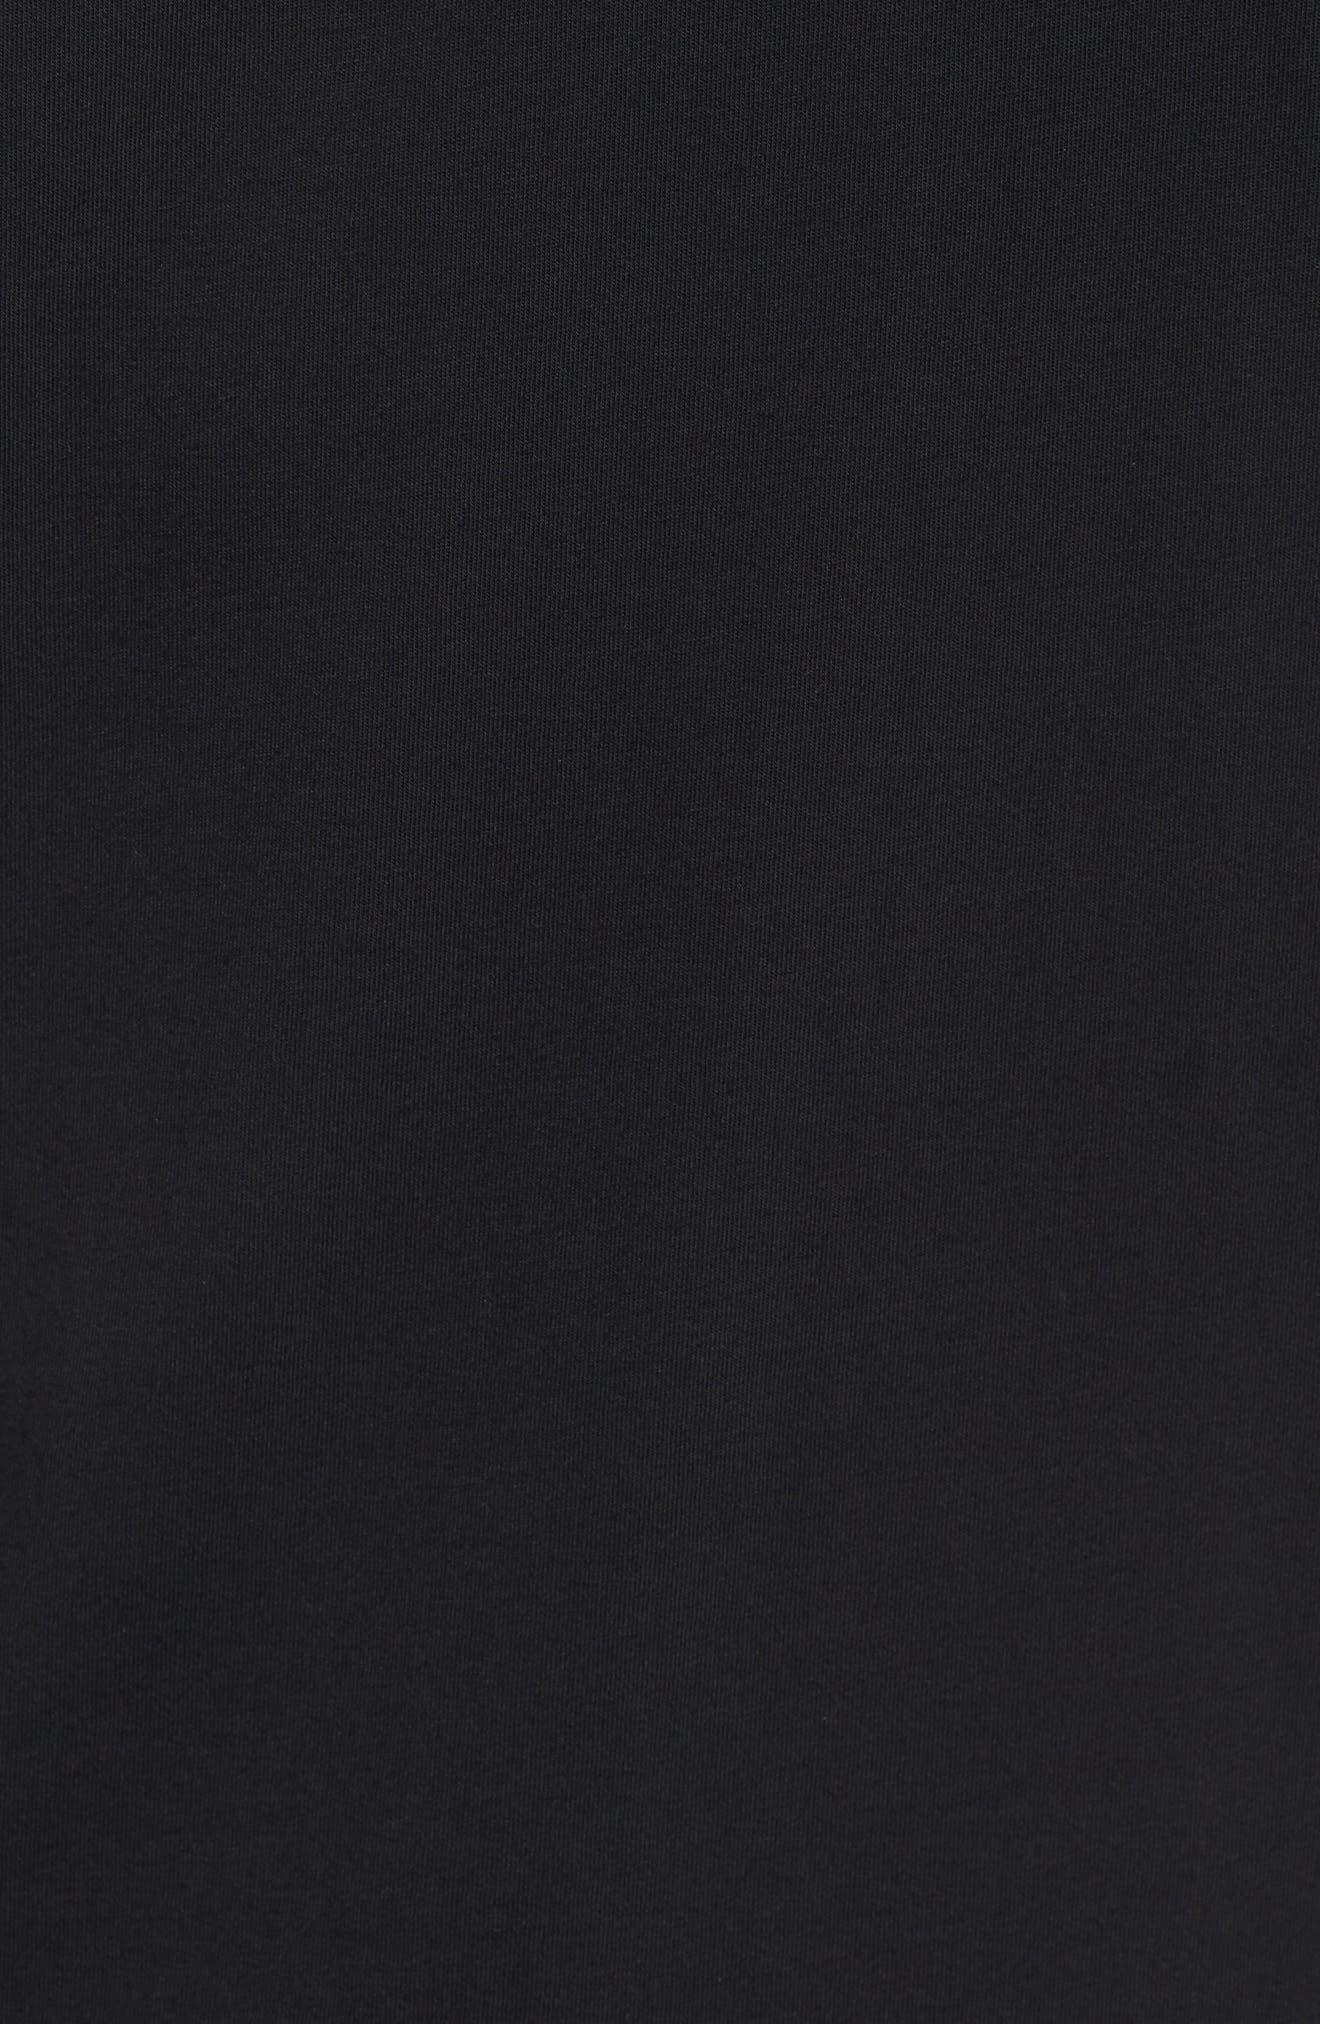 Jordan Sportswear Graphic Shirt,                             Alternate thumbnail 5, color,                             Black/ White